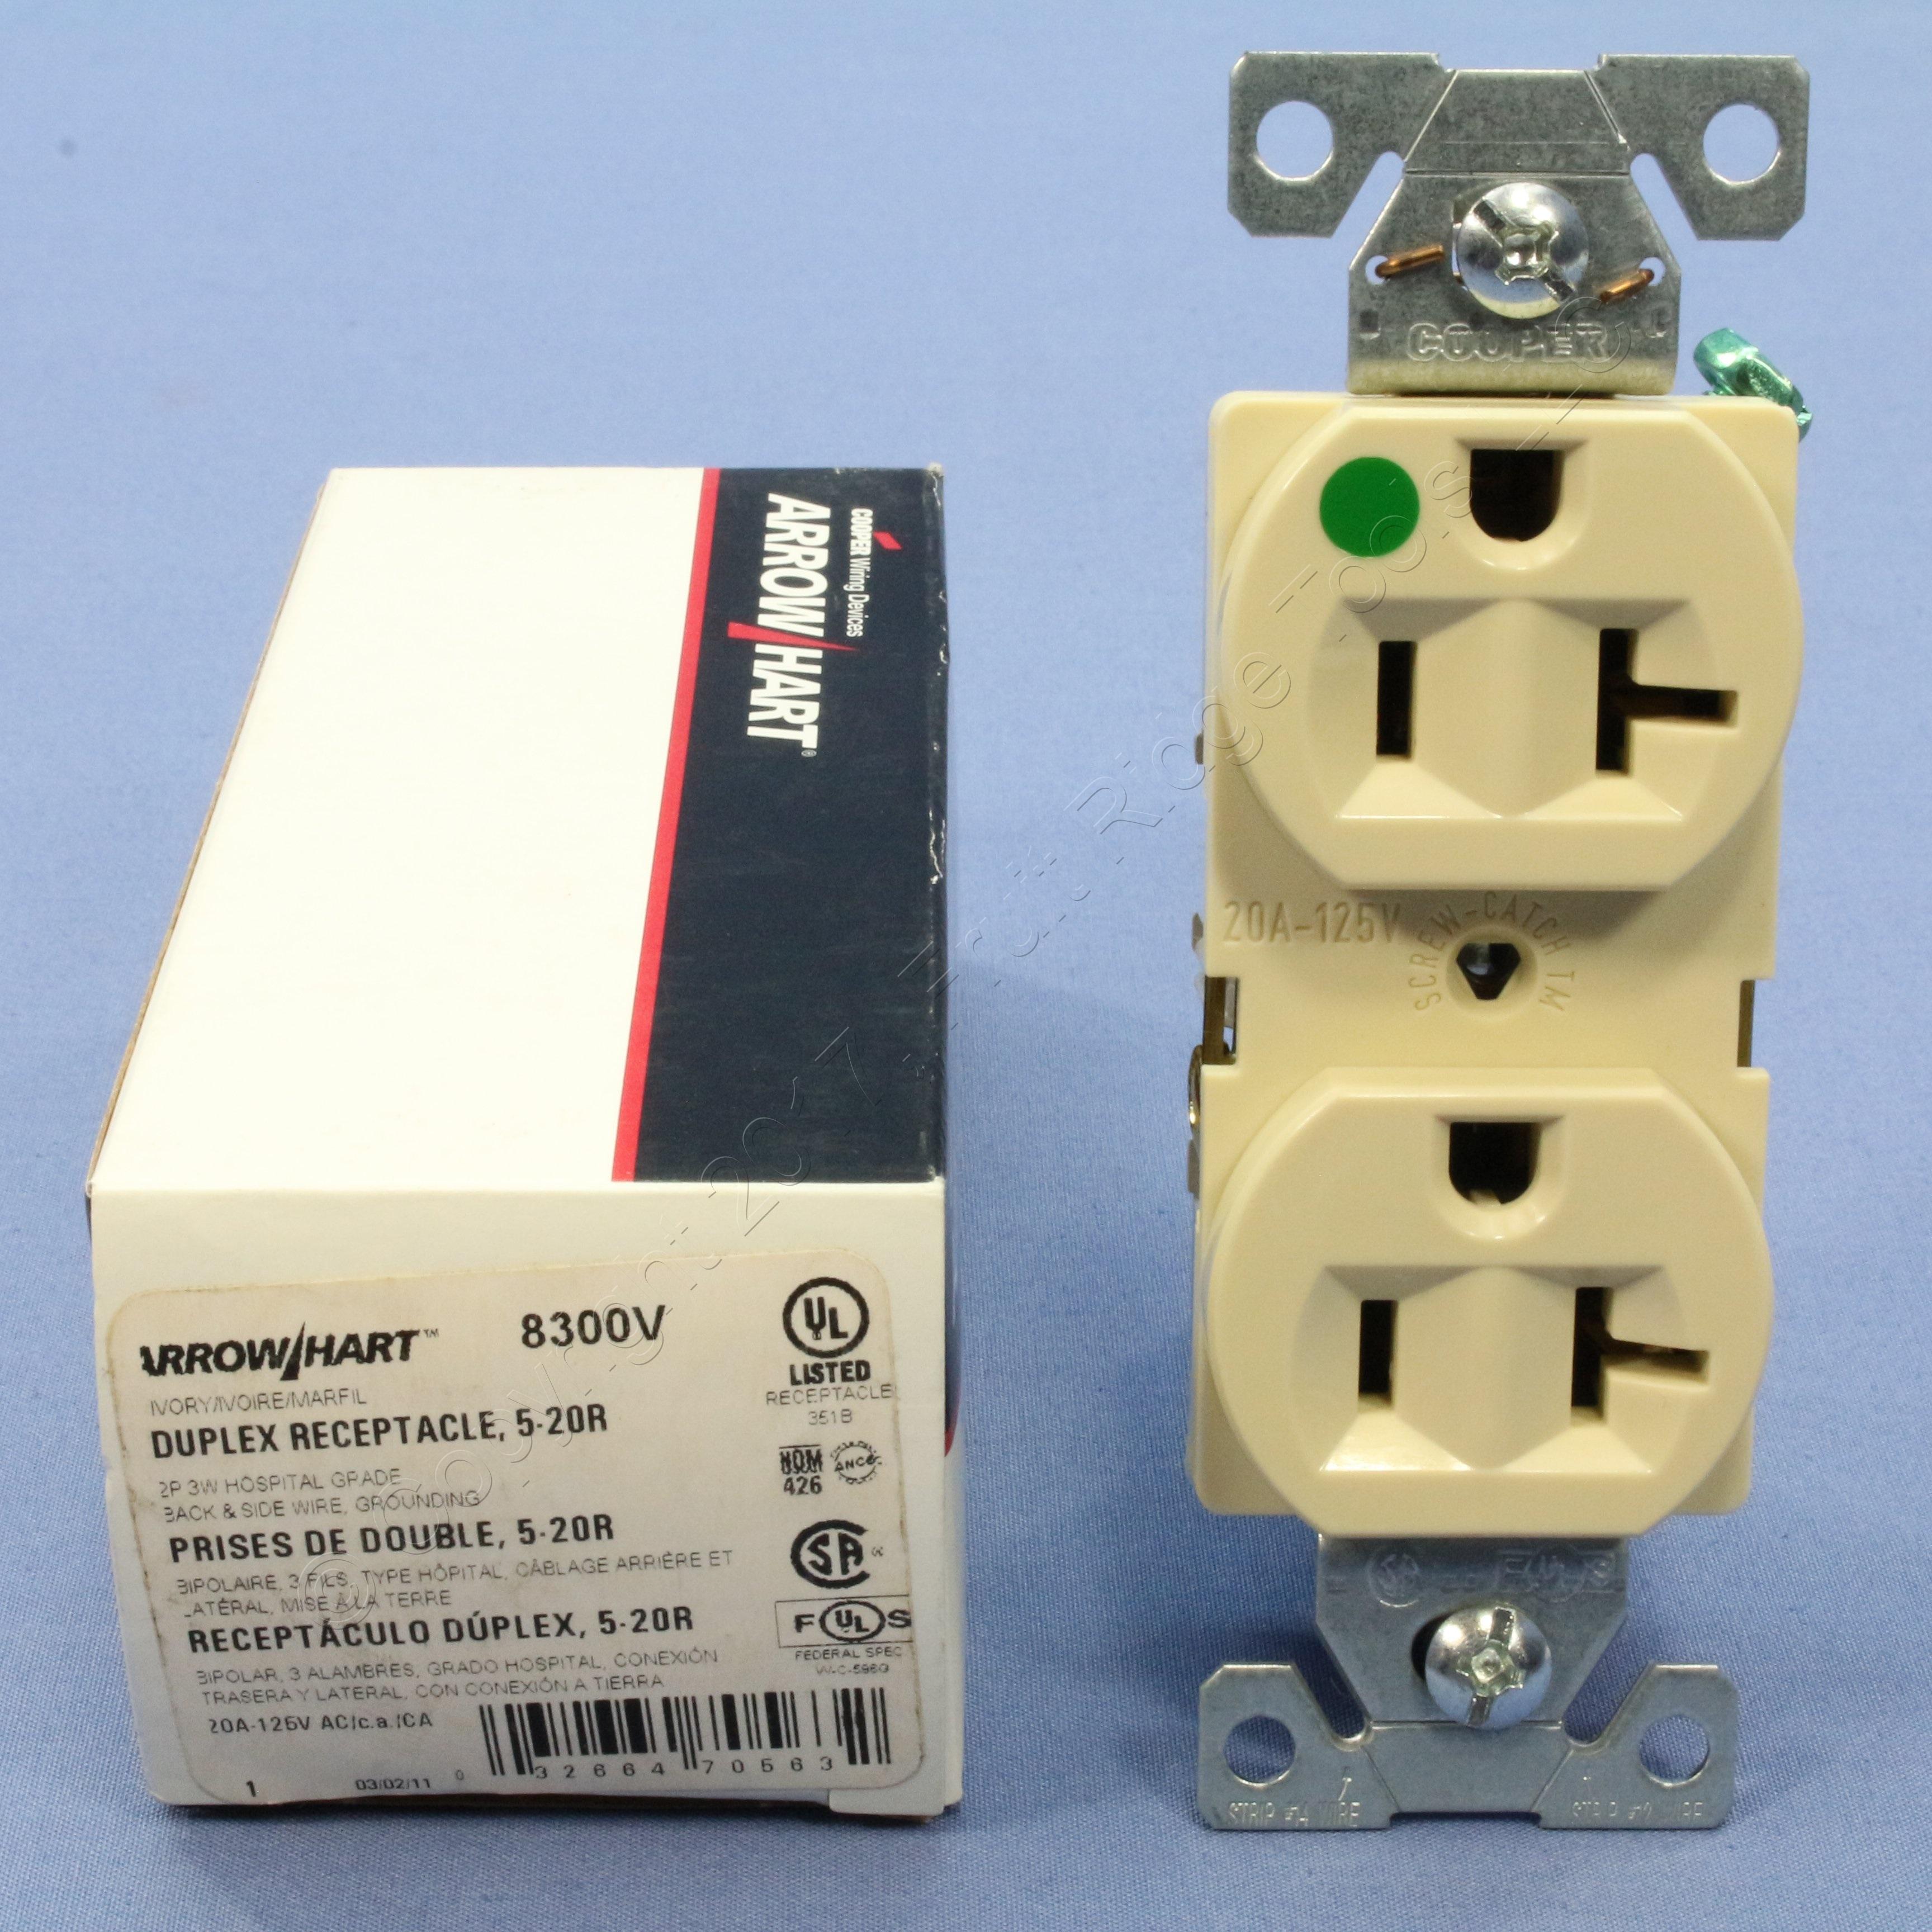 Pleasant Cooper Ivory Hospital Grade Duplex Receptacle Outlets Nema 5 20R 20A Wiring Database Gentotyuccorg